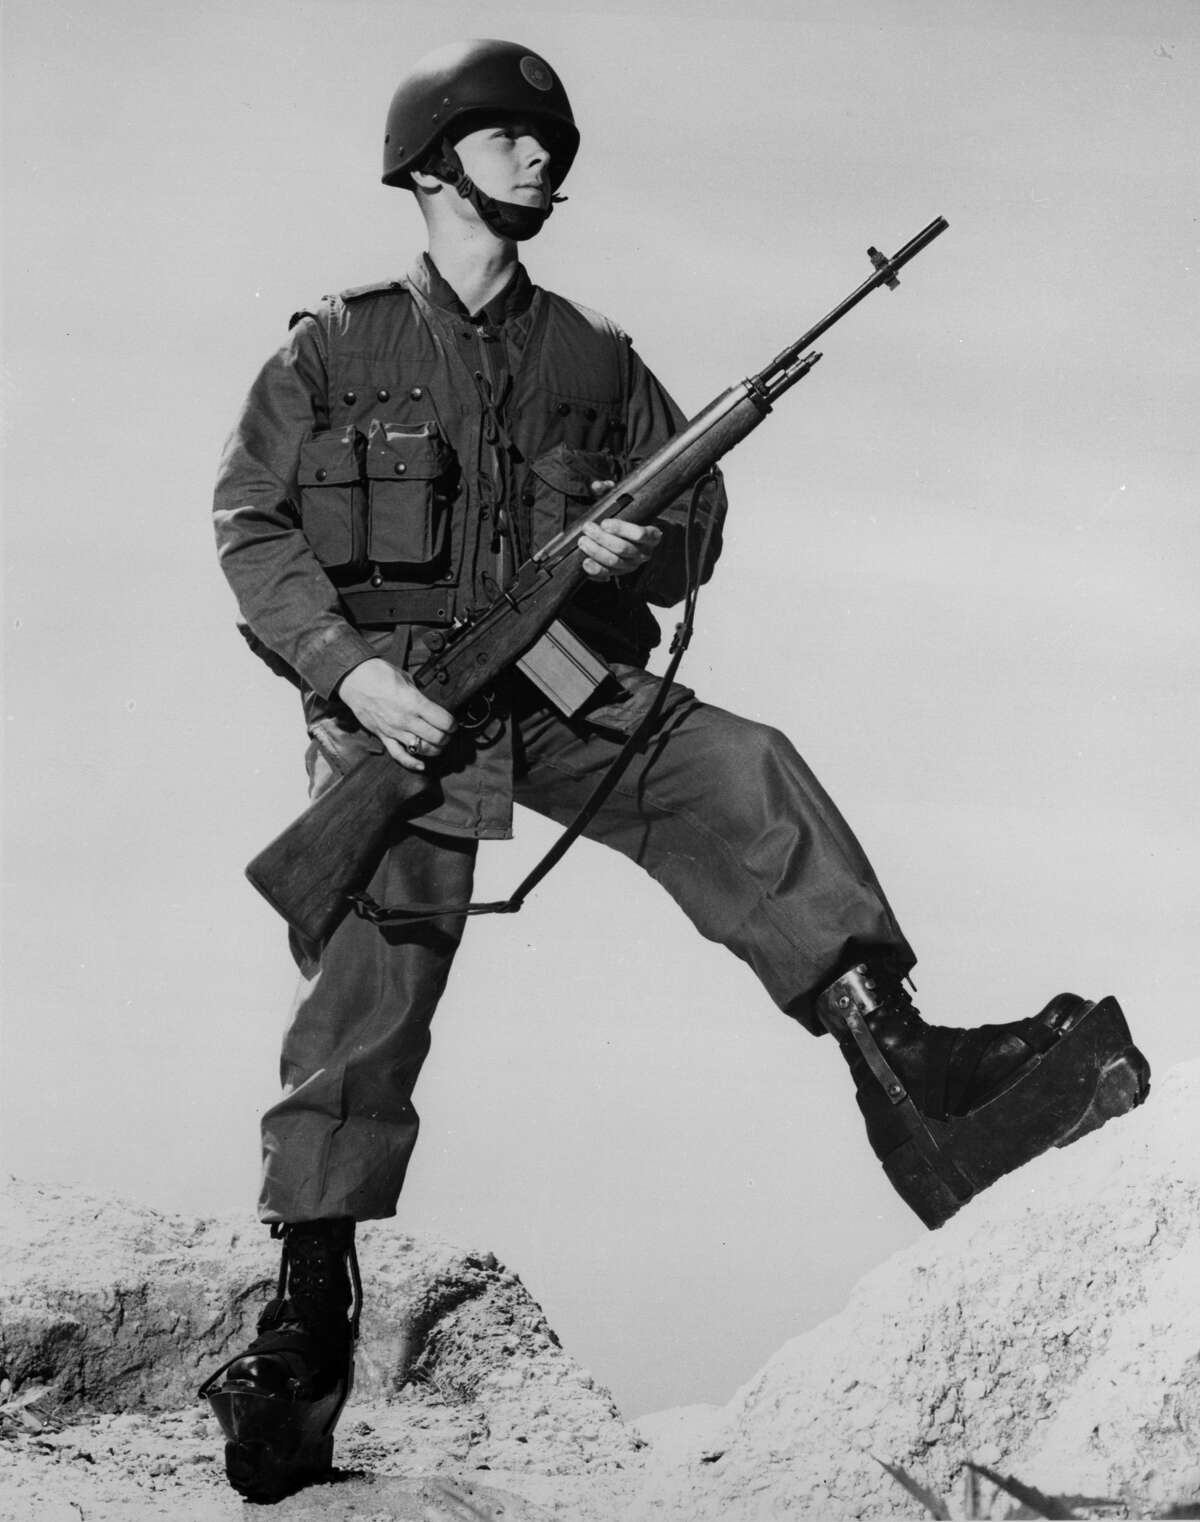 M14 rifle Years active: 1959 - 1964